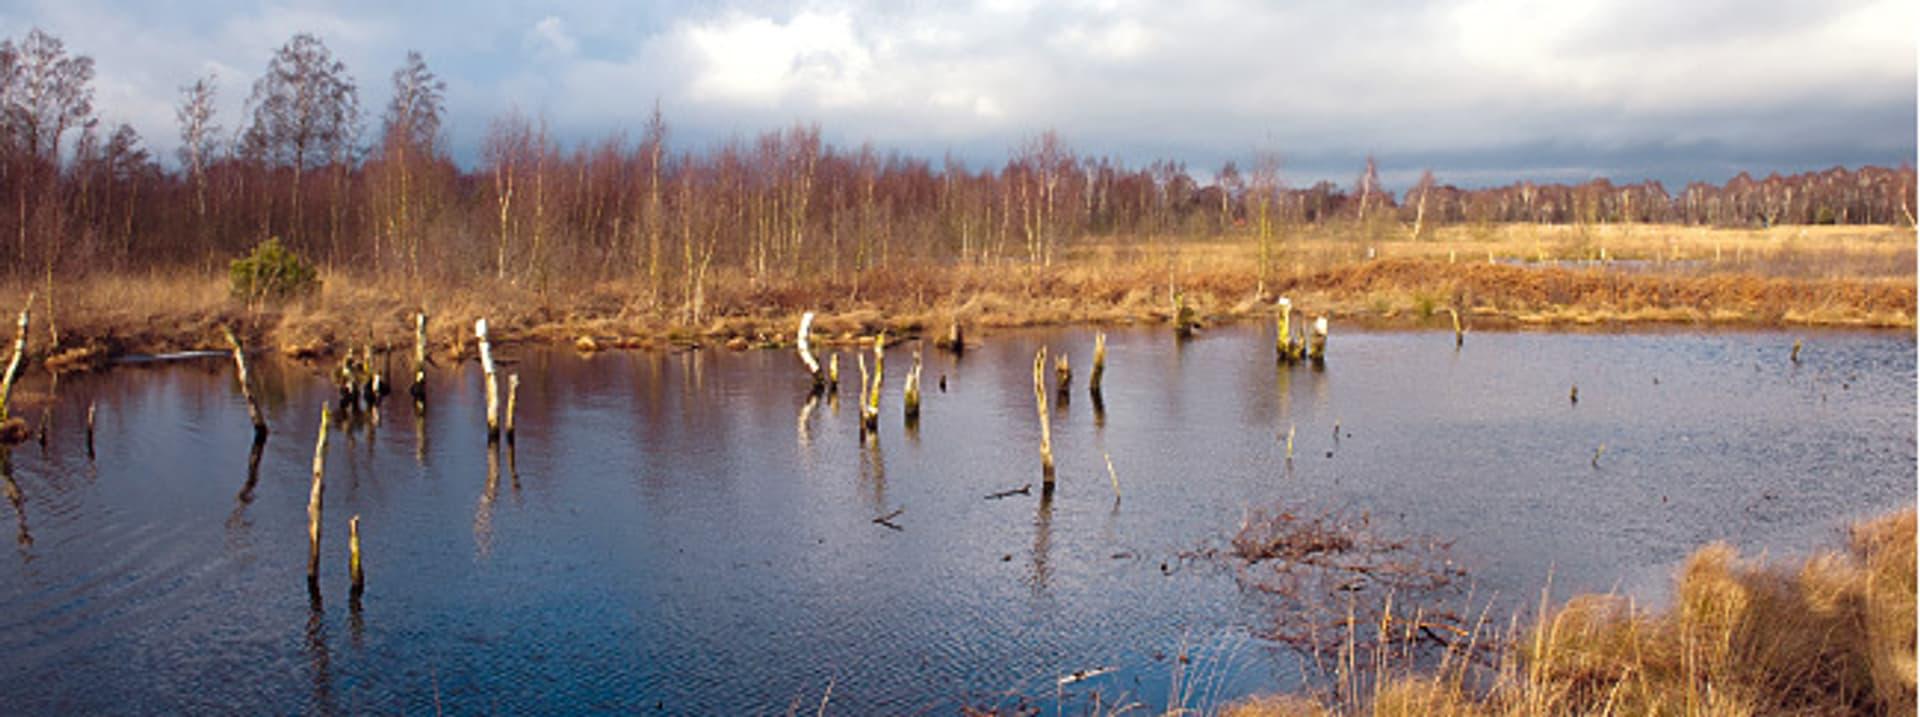 Diepholzer Moor (Fotos: Thomas Langreder)